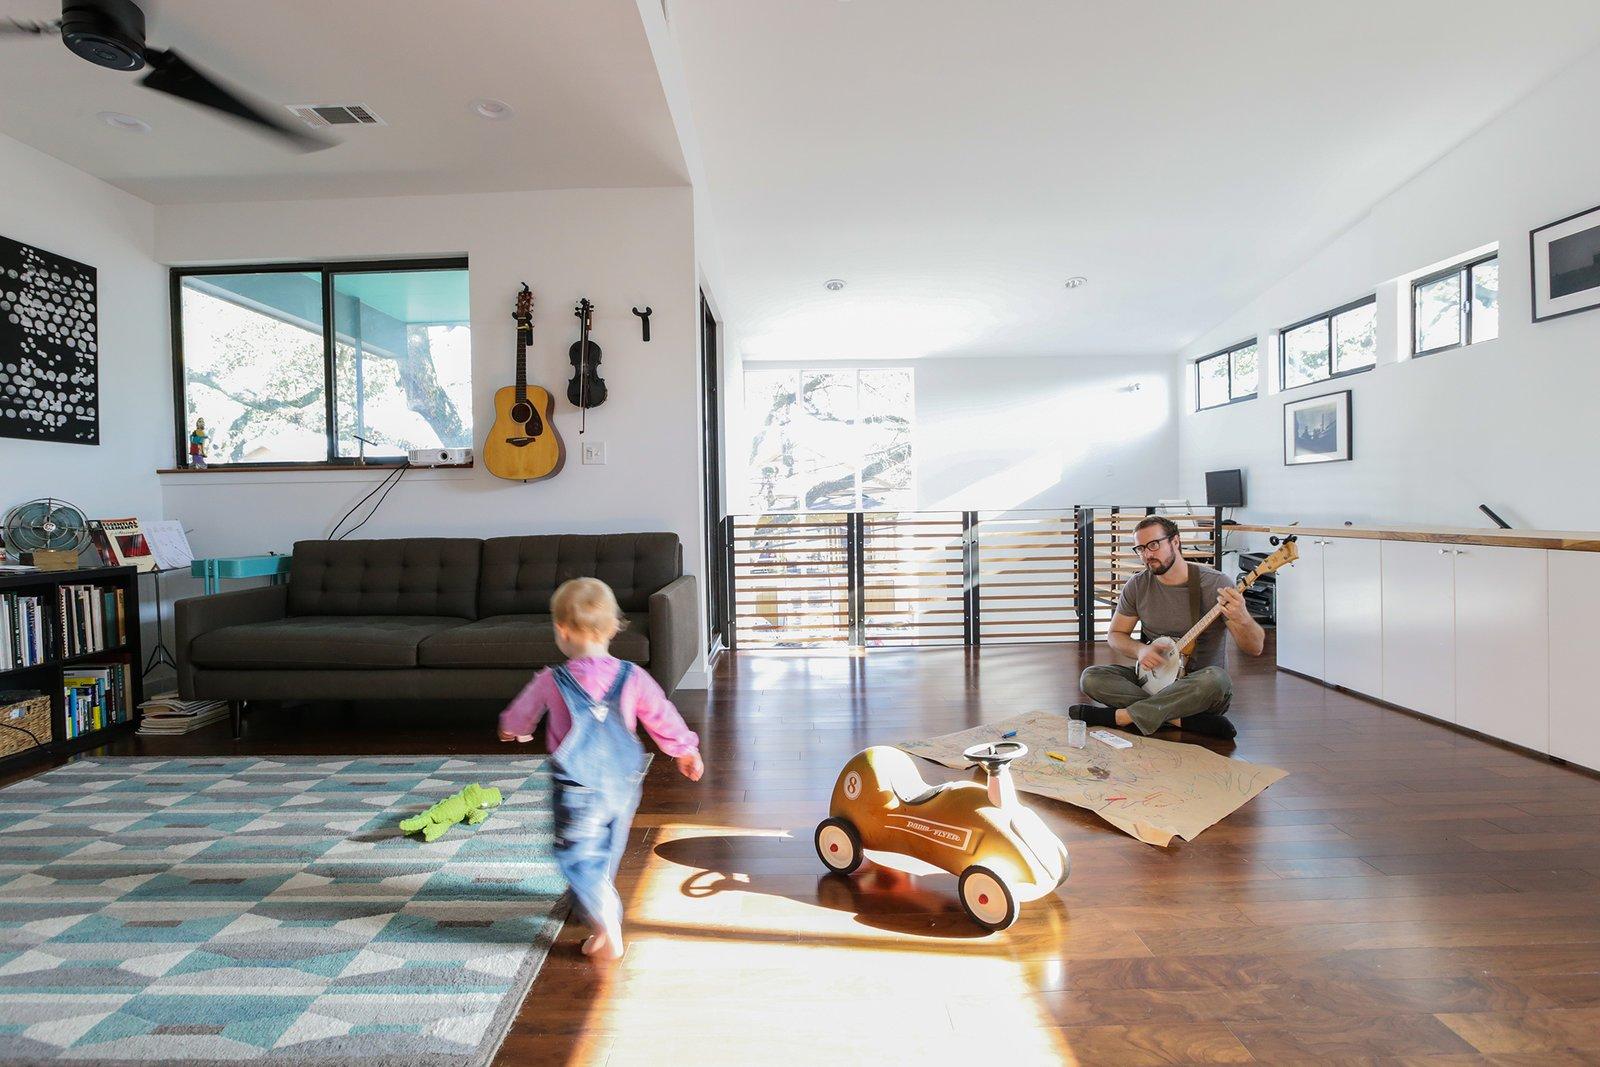 Living Room, Ceiling Lighting, Sofa, and Dark Hardwood Floor Second floor living spaces  Dorgenois